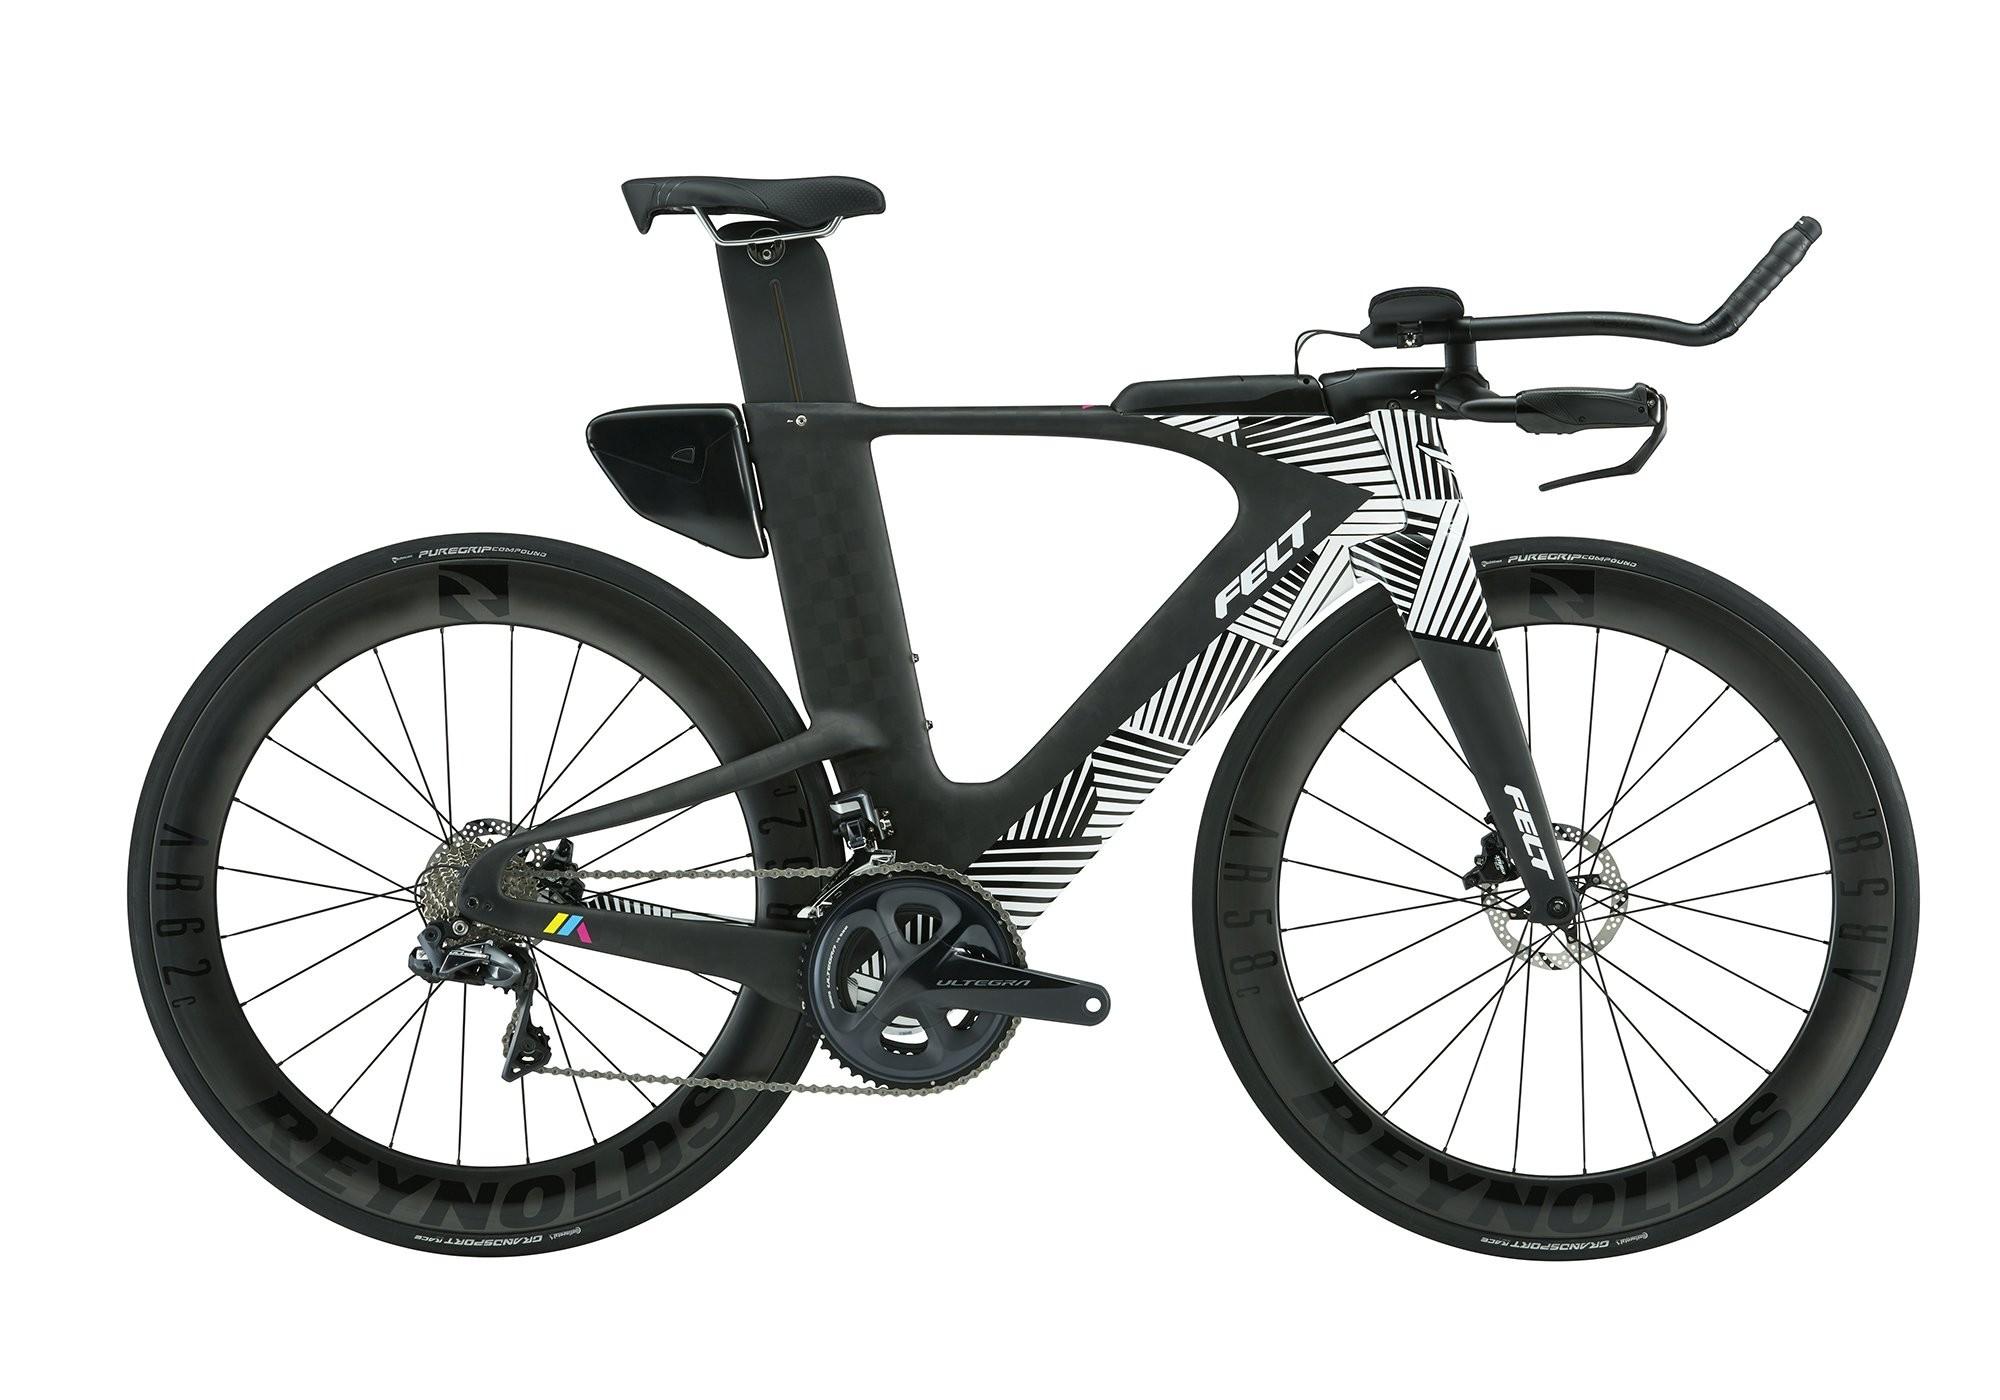 Bicicleta de Triathlon Felt IA Advanced Force Etap Axs